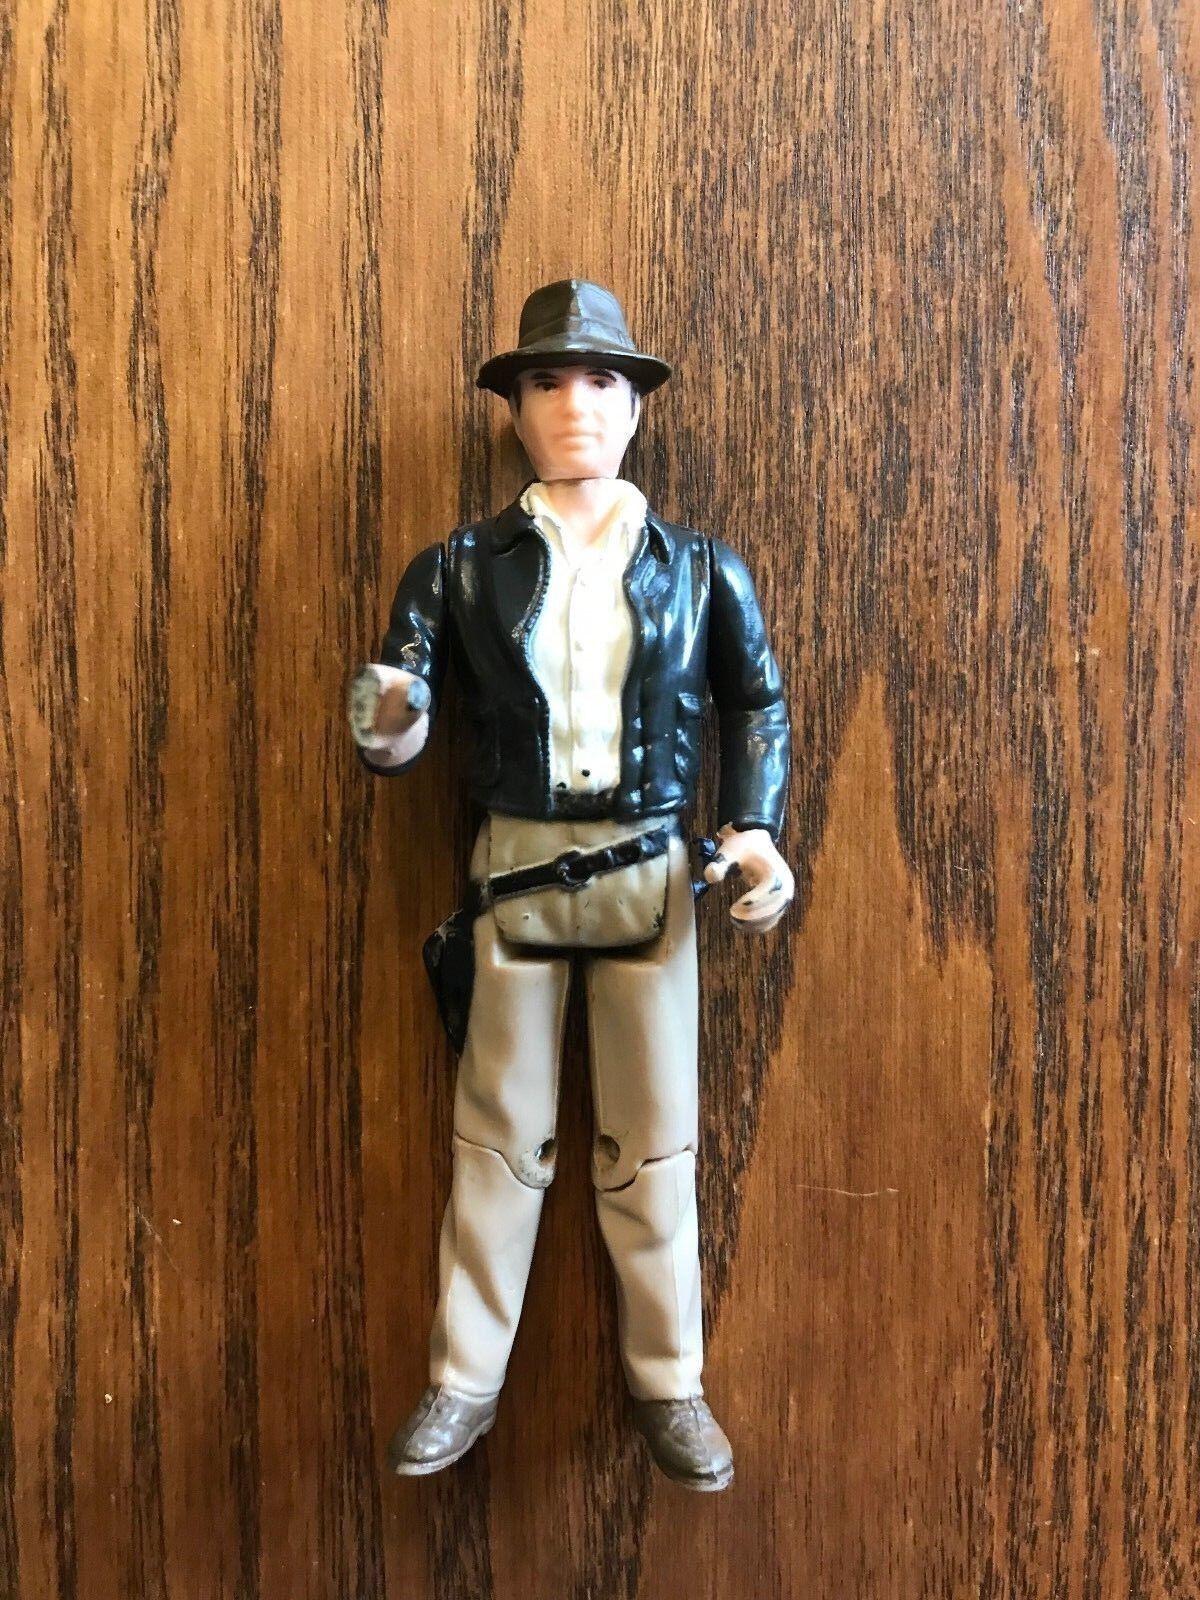 Indiana jones - actionfigur kenner rotla jahrgang